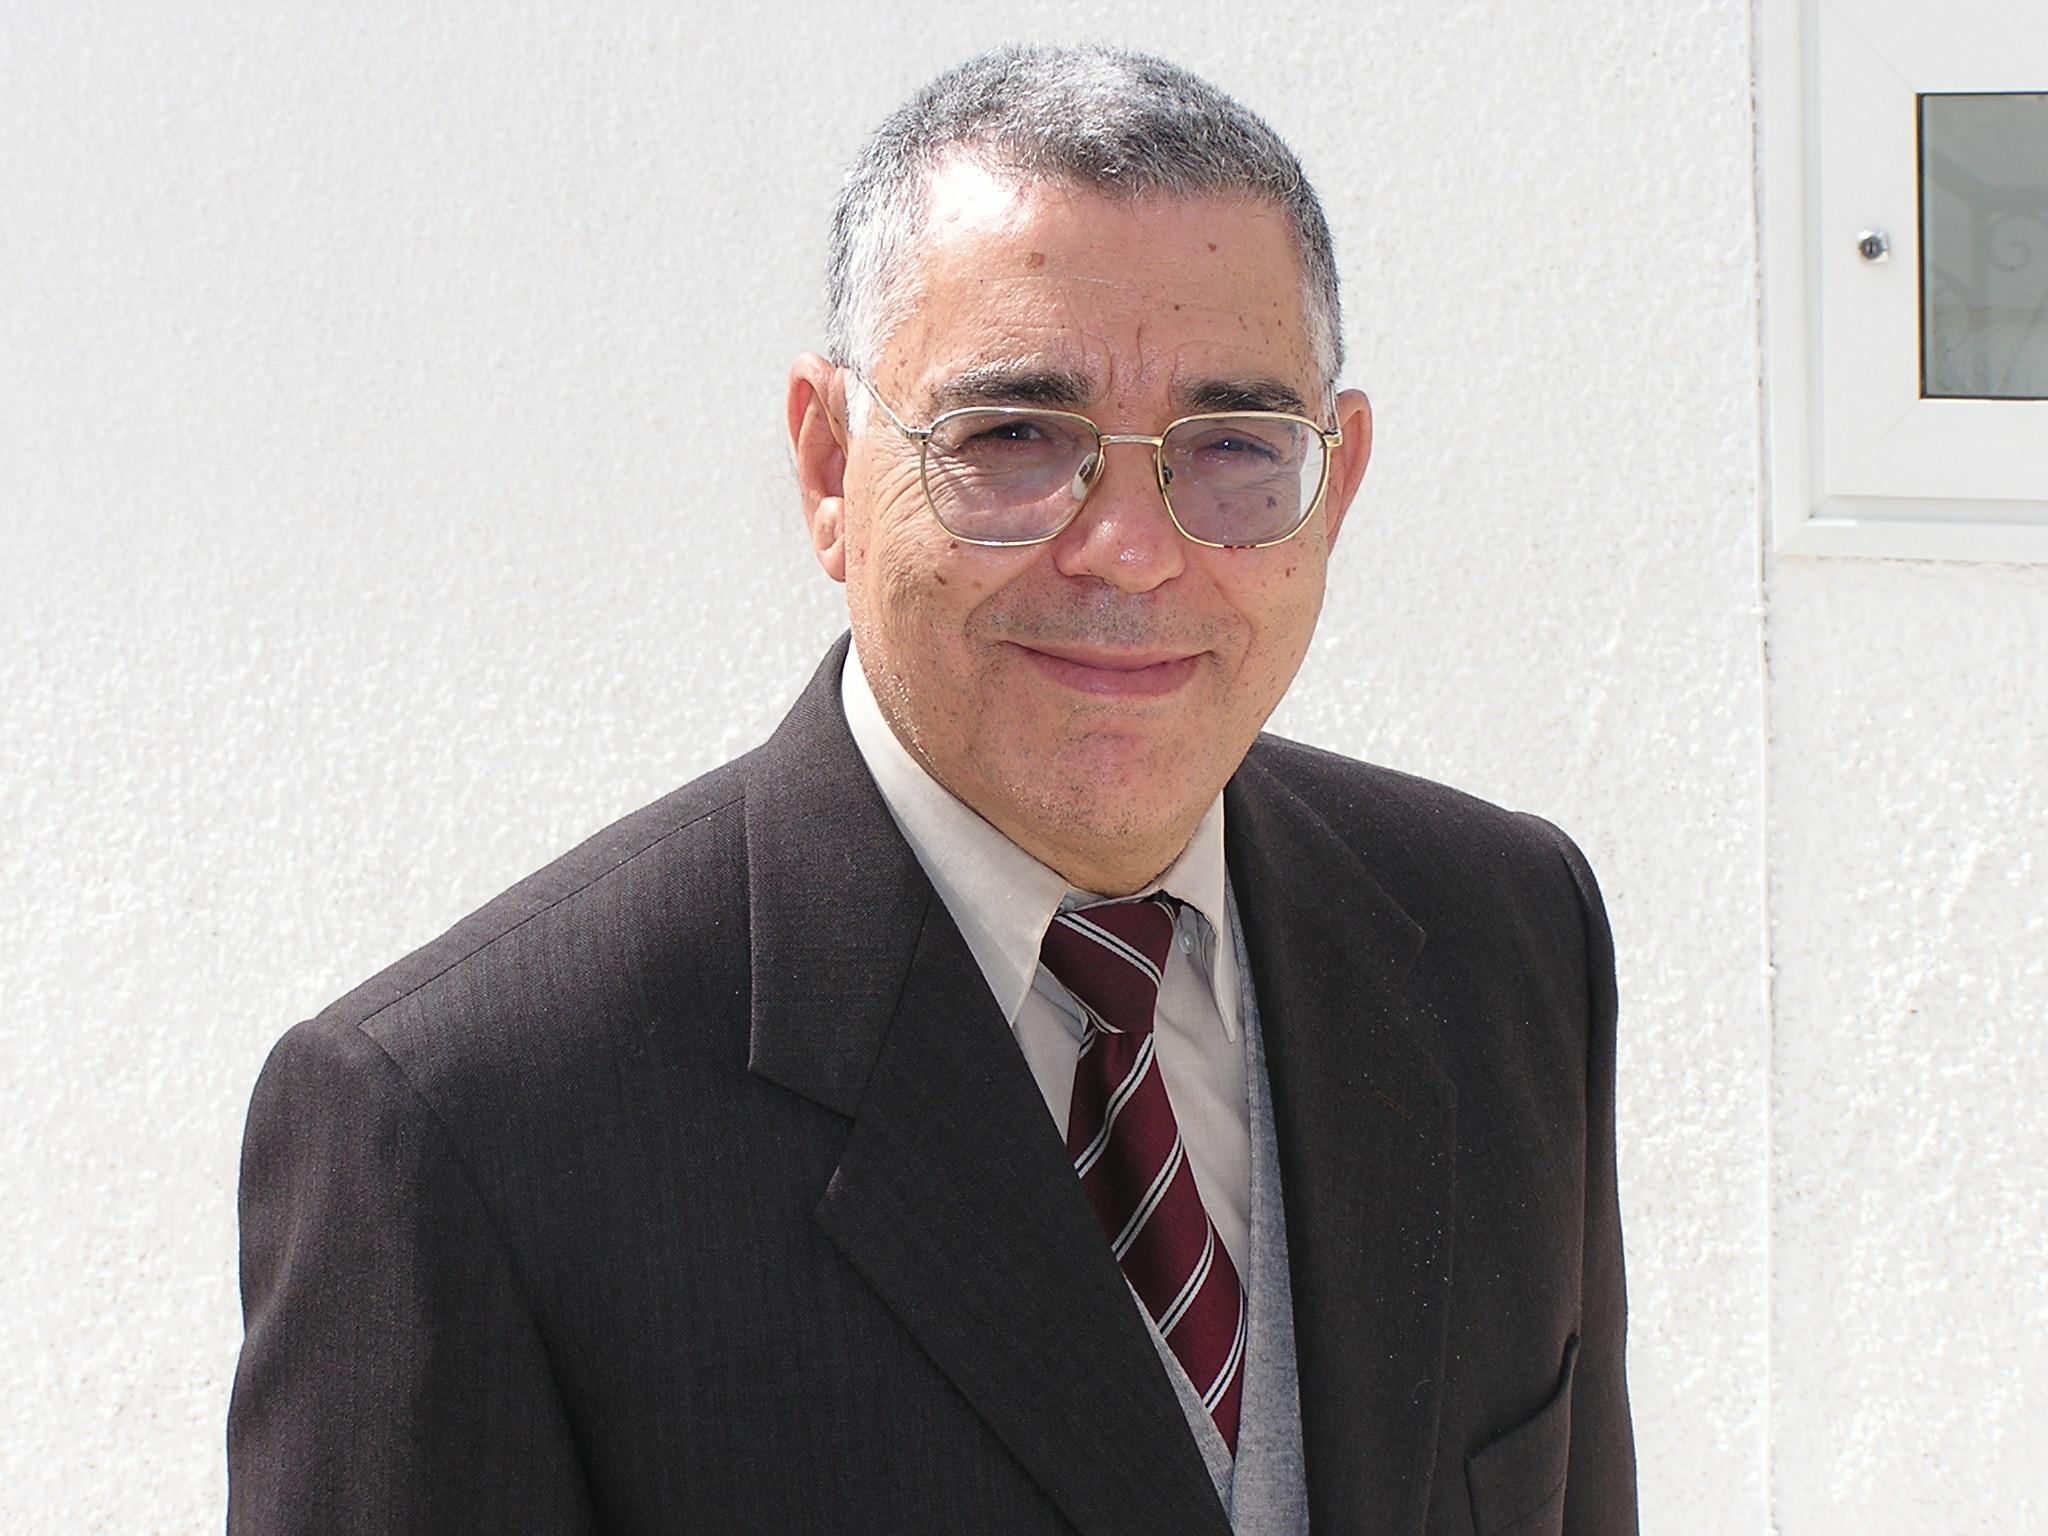 Abdelaziz DAOUD Professeur universitaire et expert international de l'ONUDI